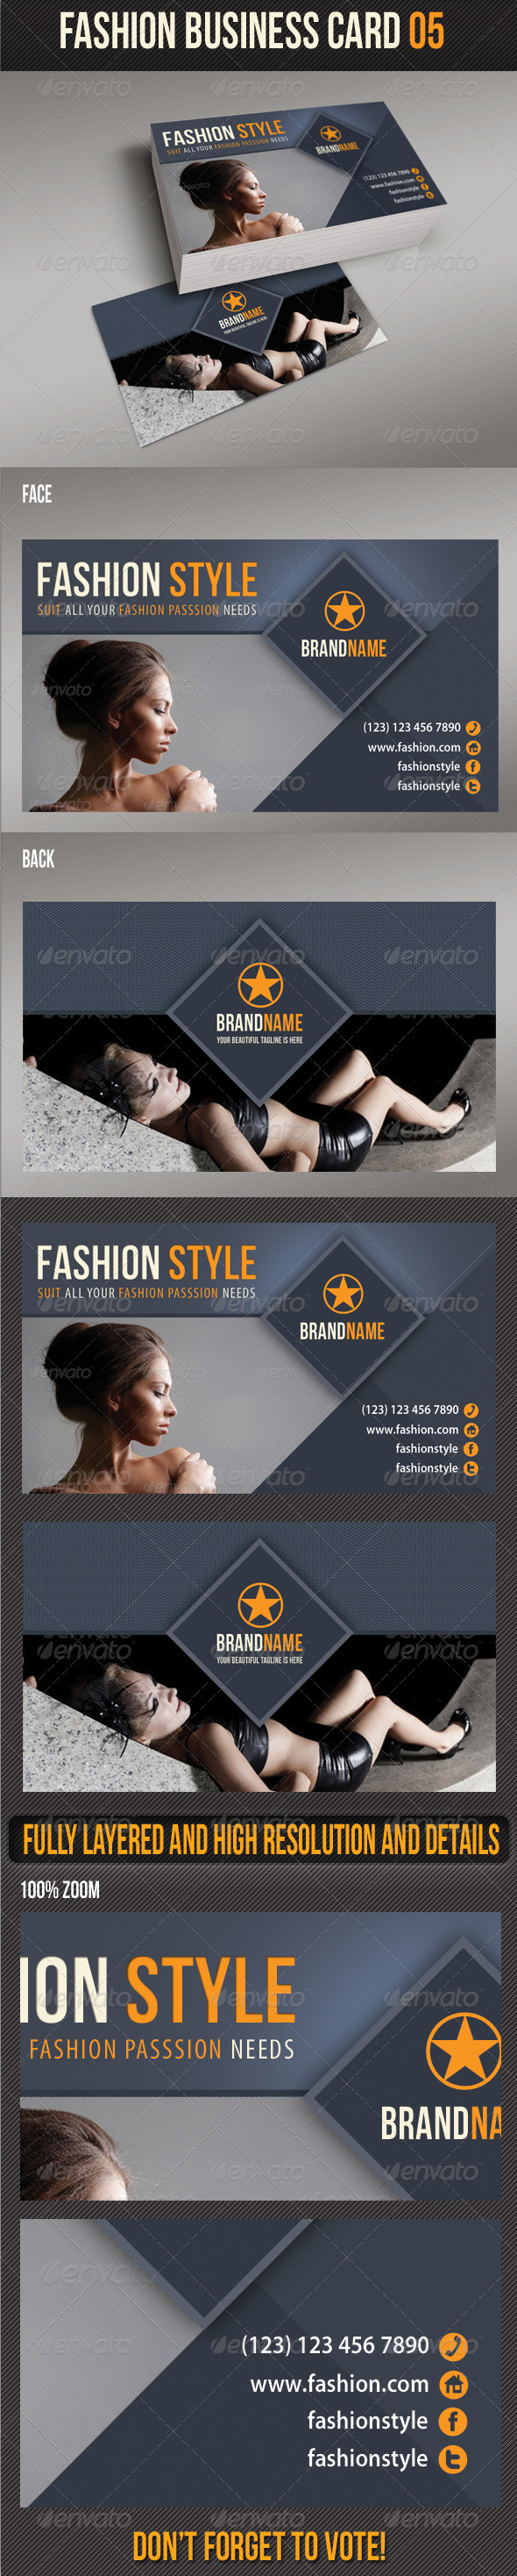 GraphicRiver Fashion Business Card 05 6272722